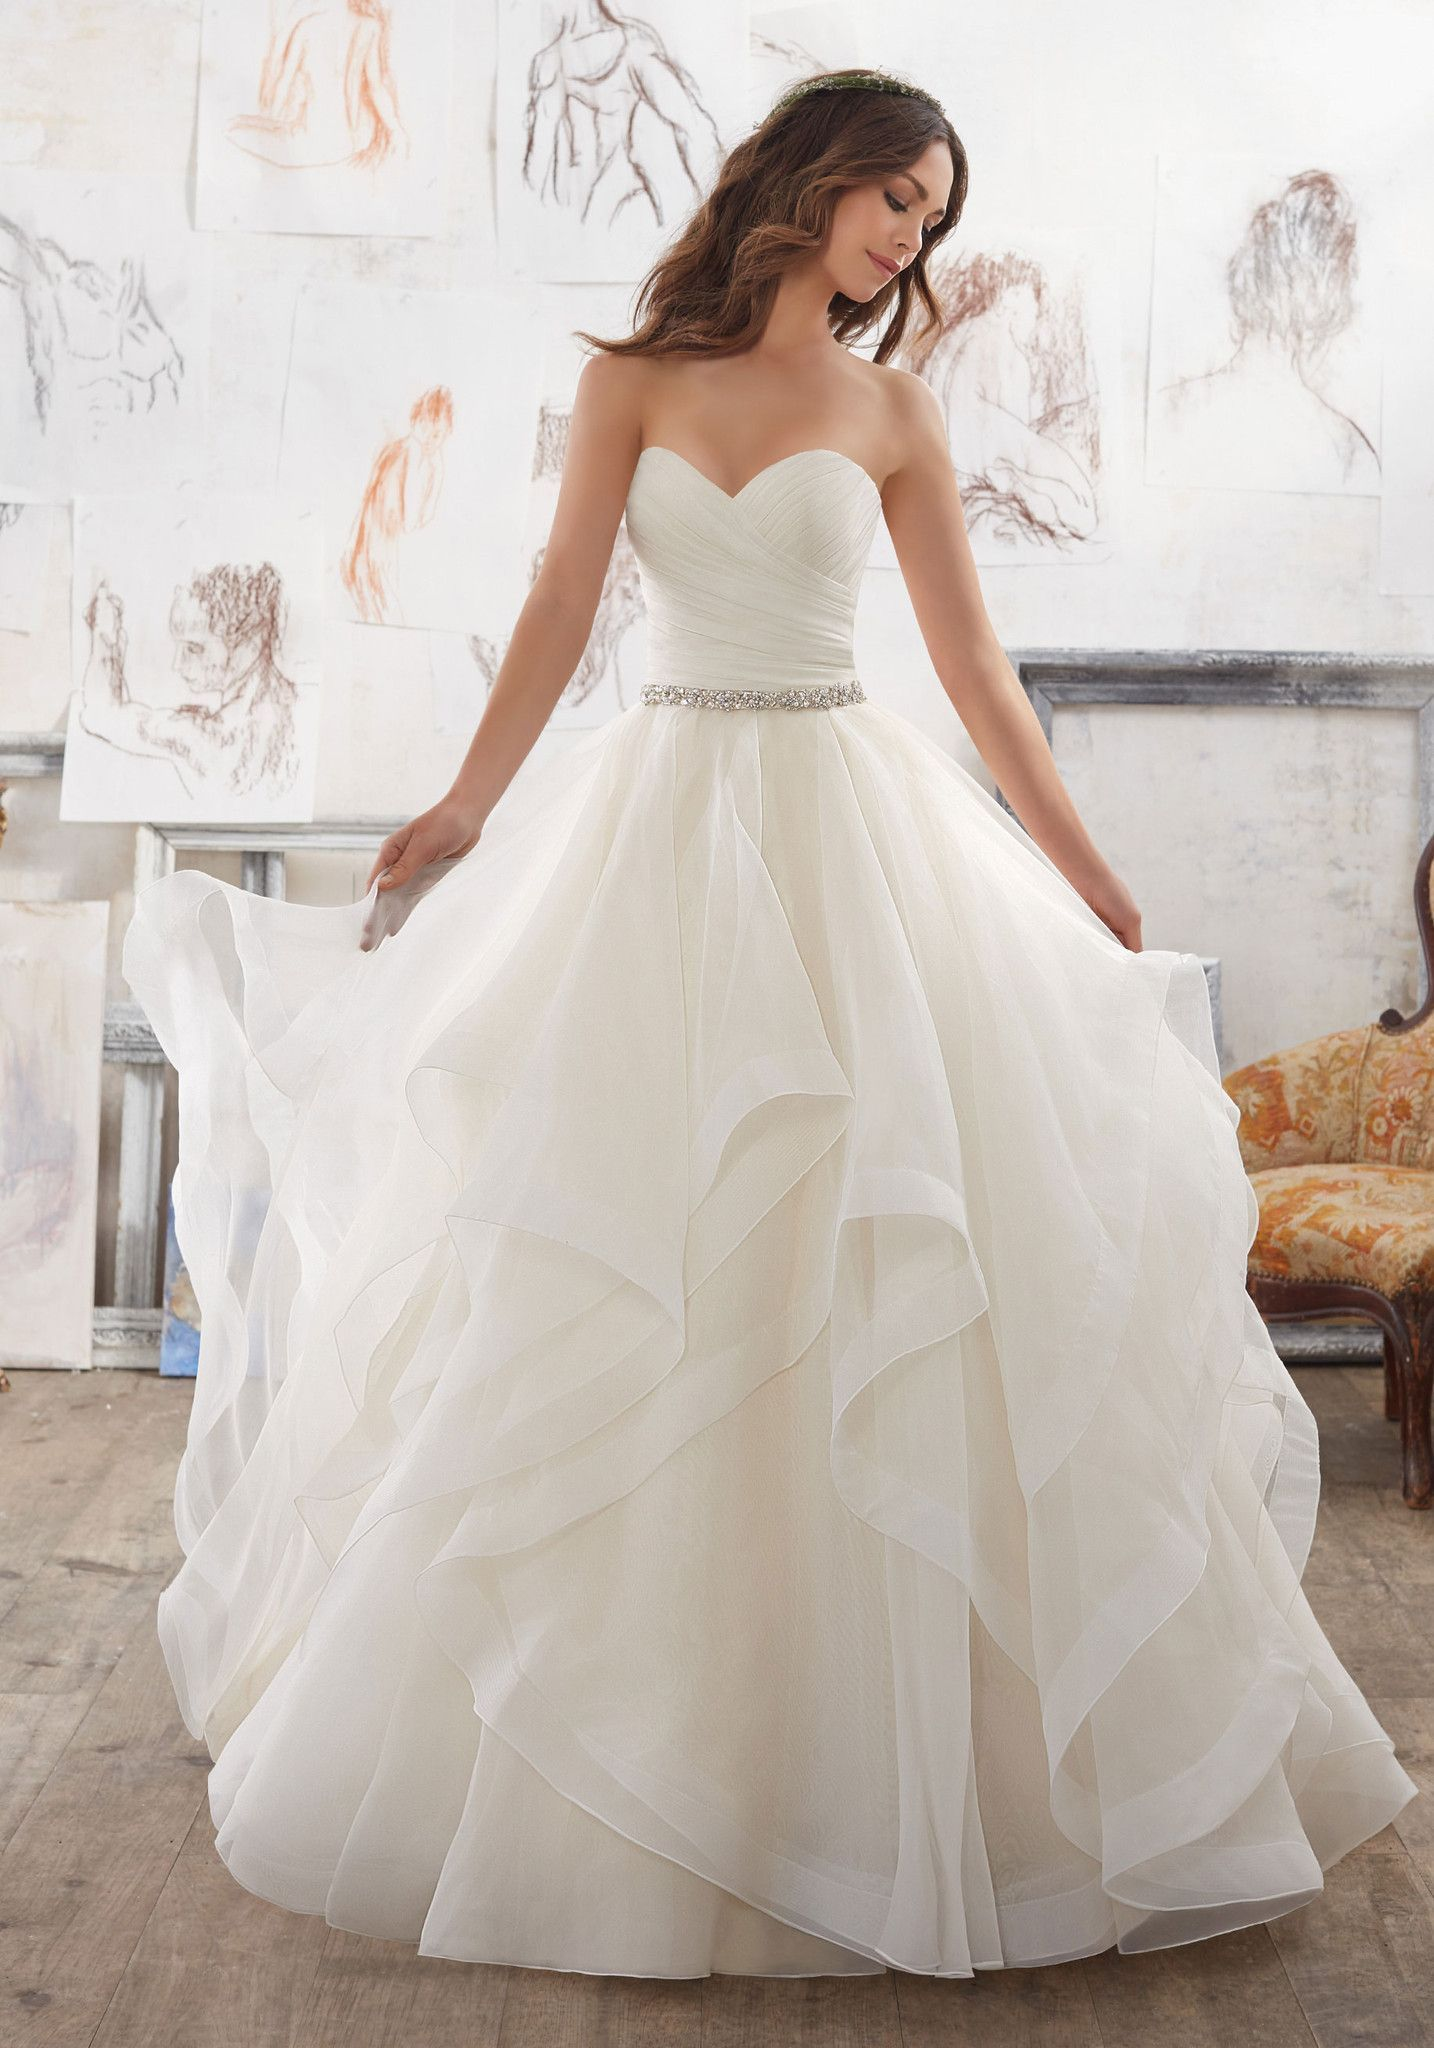 Stunning wedding dresses  Blu  Marissa    All Dressed Up Bridal Gown  Bridal gowns